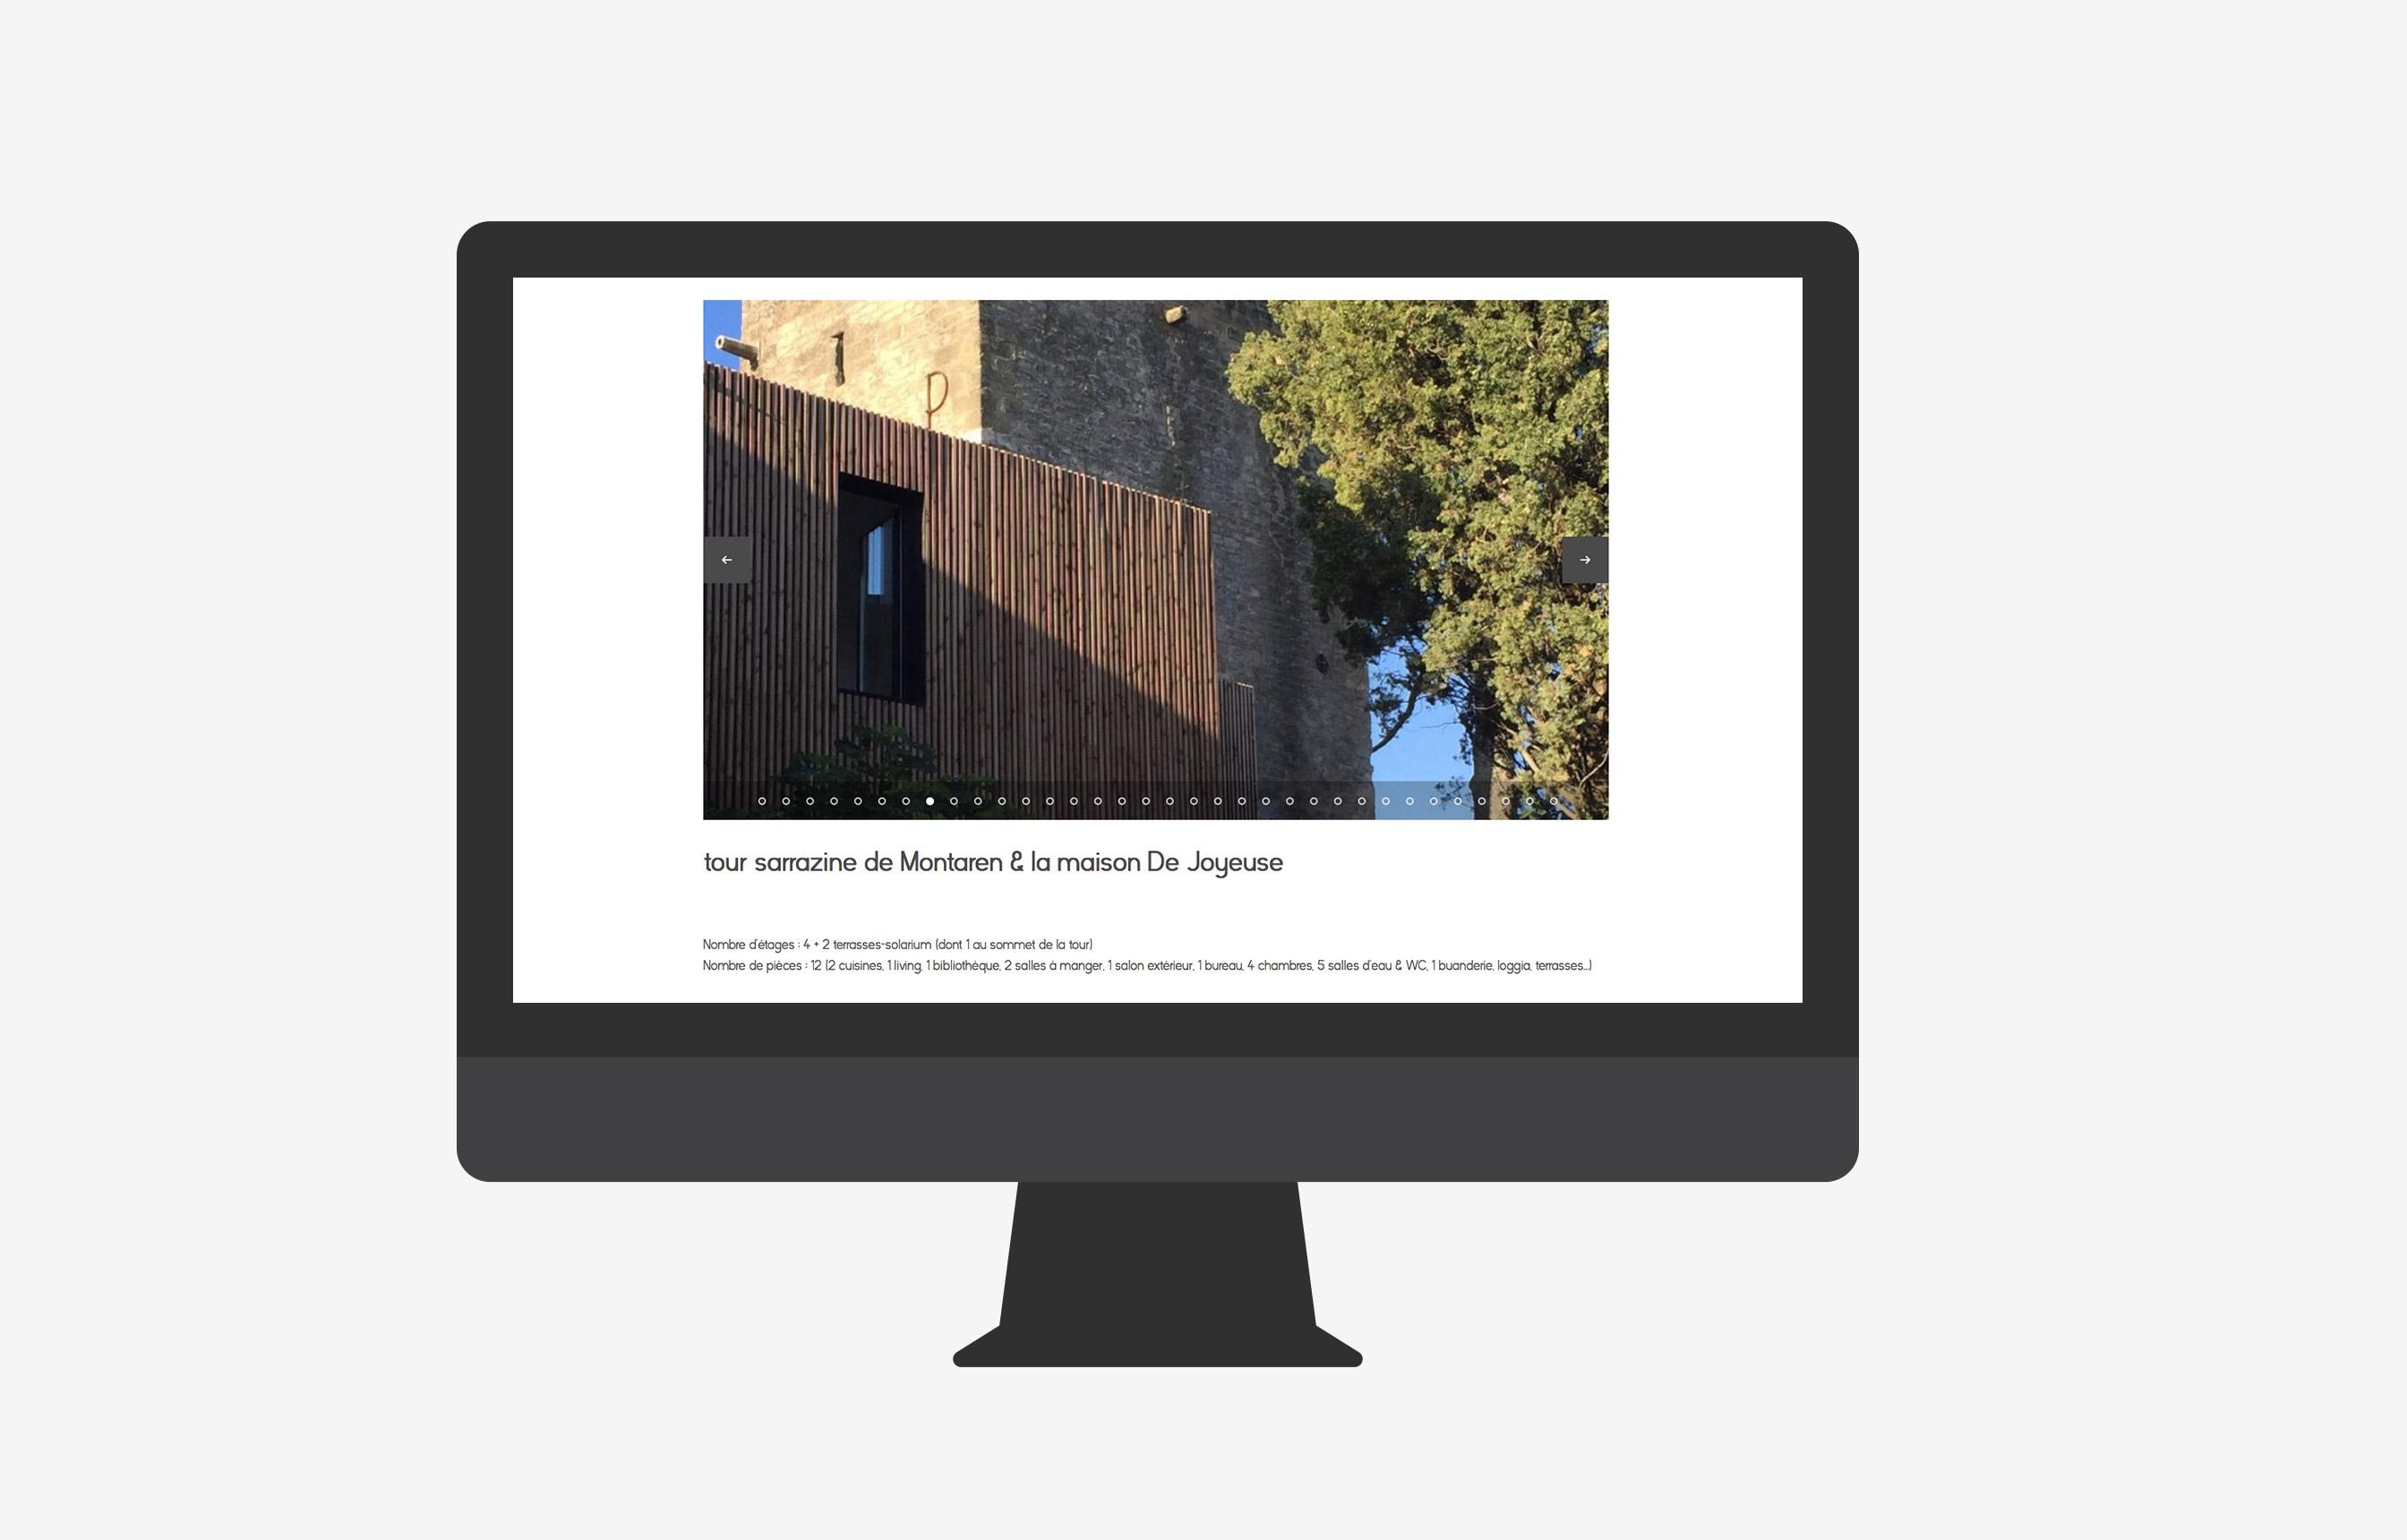 04-tour-sarrazine-pikteo-webdesign-graphic-design-freelance-paris-bruxelles-londres